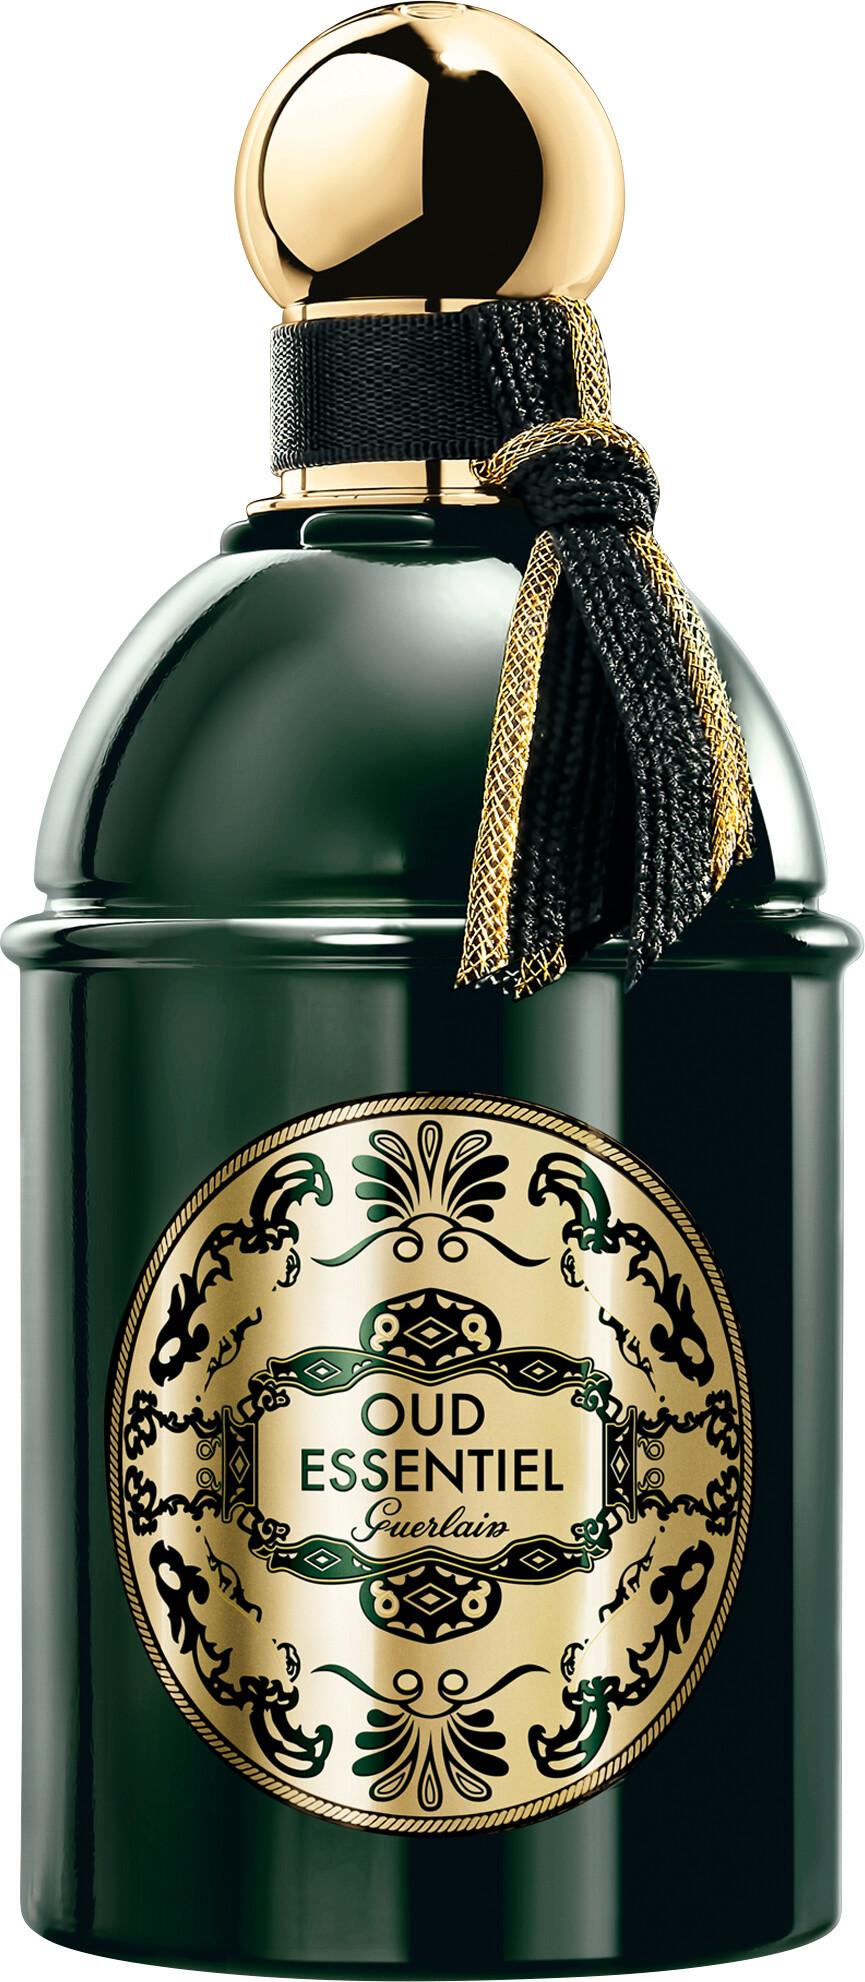 Guerlain Parfum Eau 125ml Spray Essentiel Oud De uiTPOXwkZ